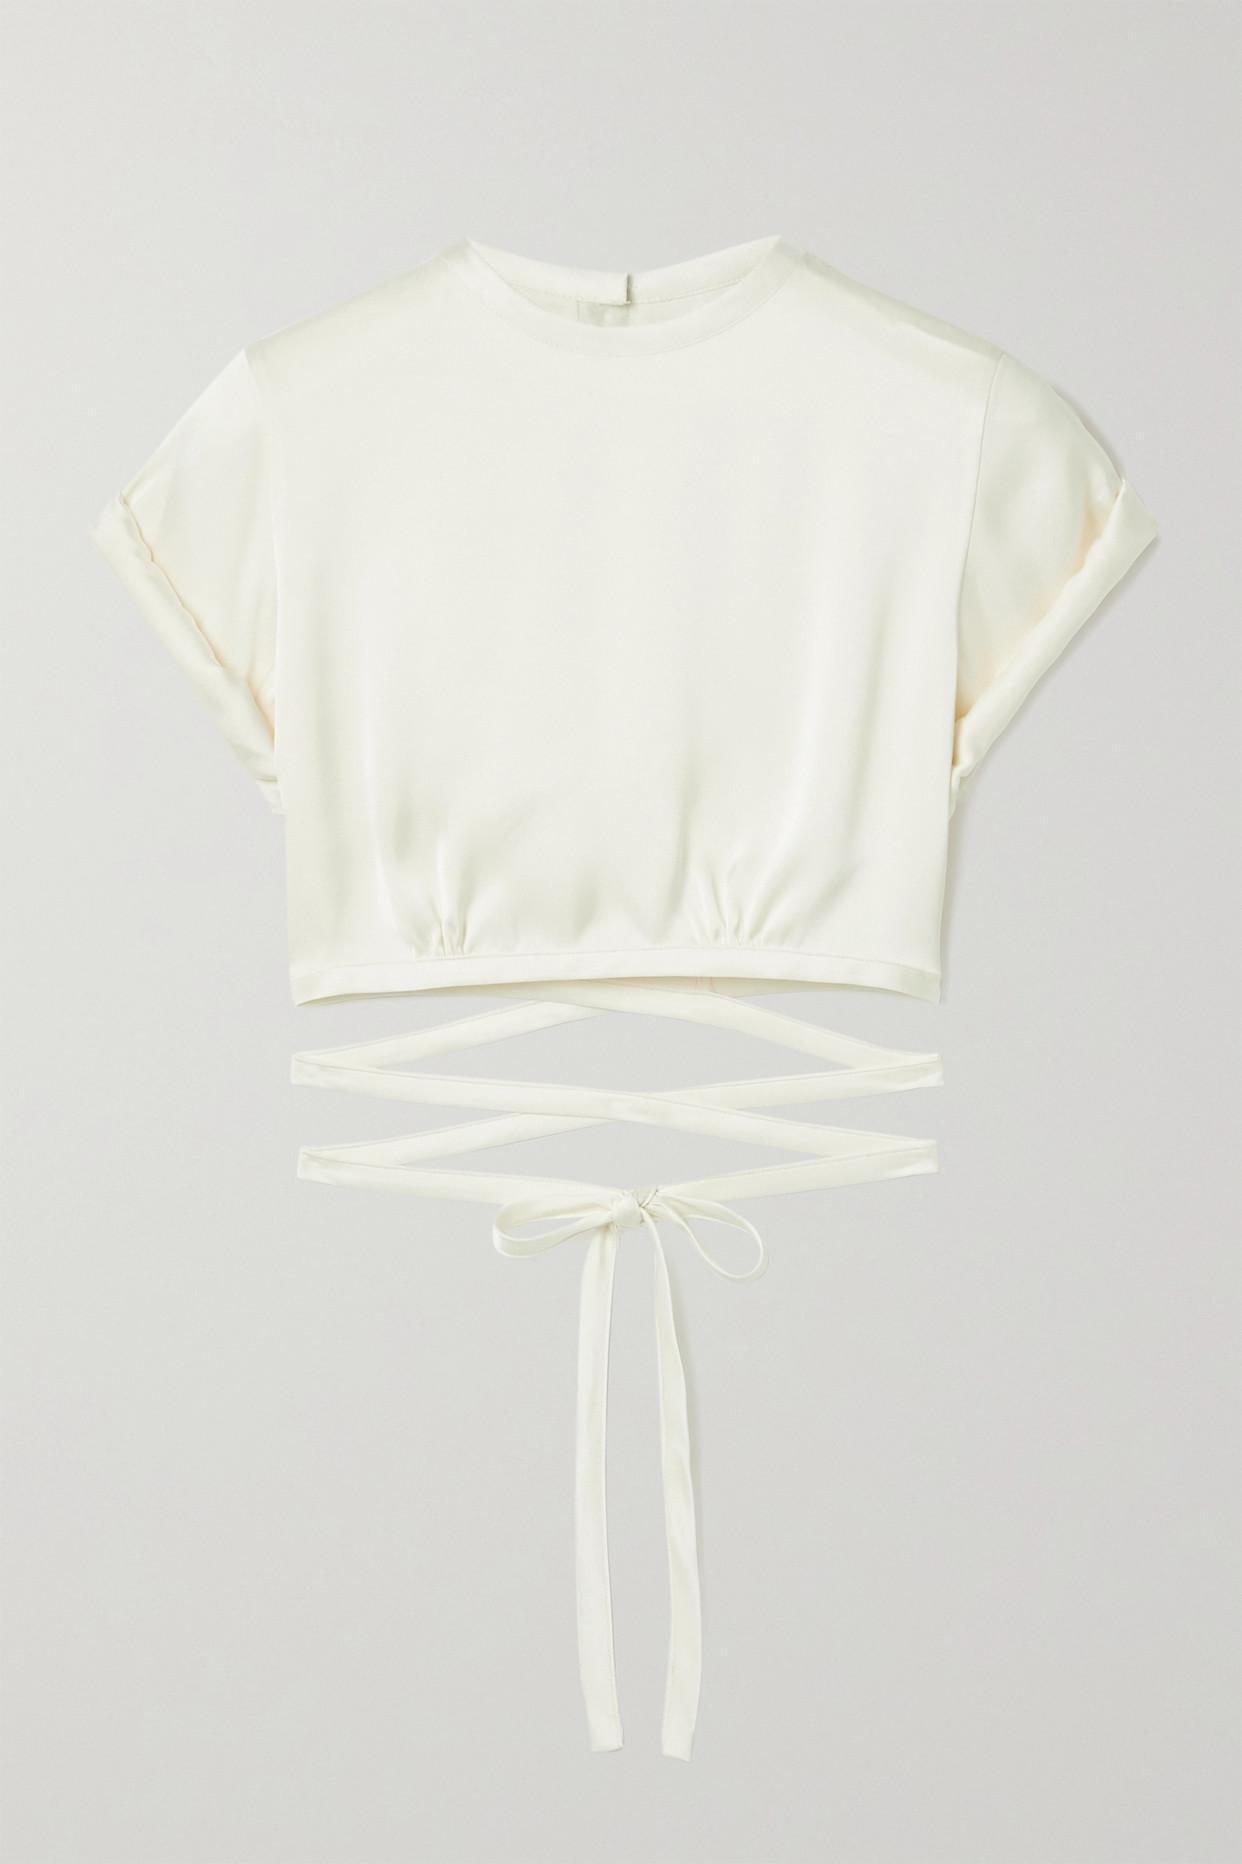 ORSEUND IRIS - Le Club Cropped Satin Top - Cream - large